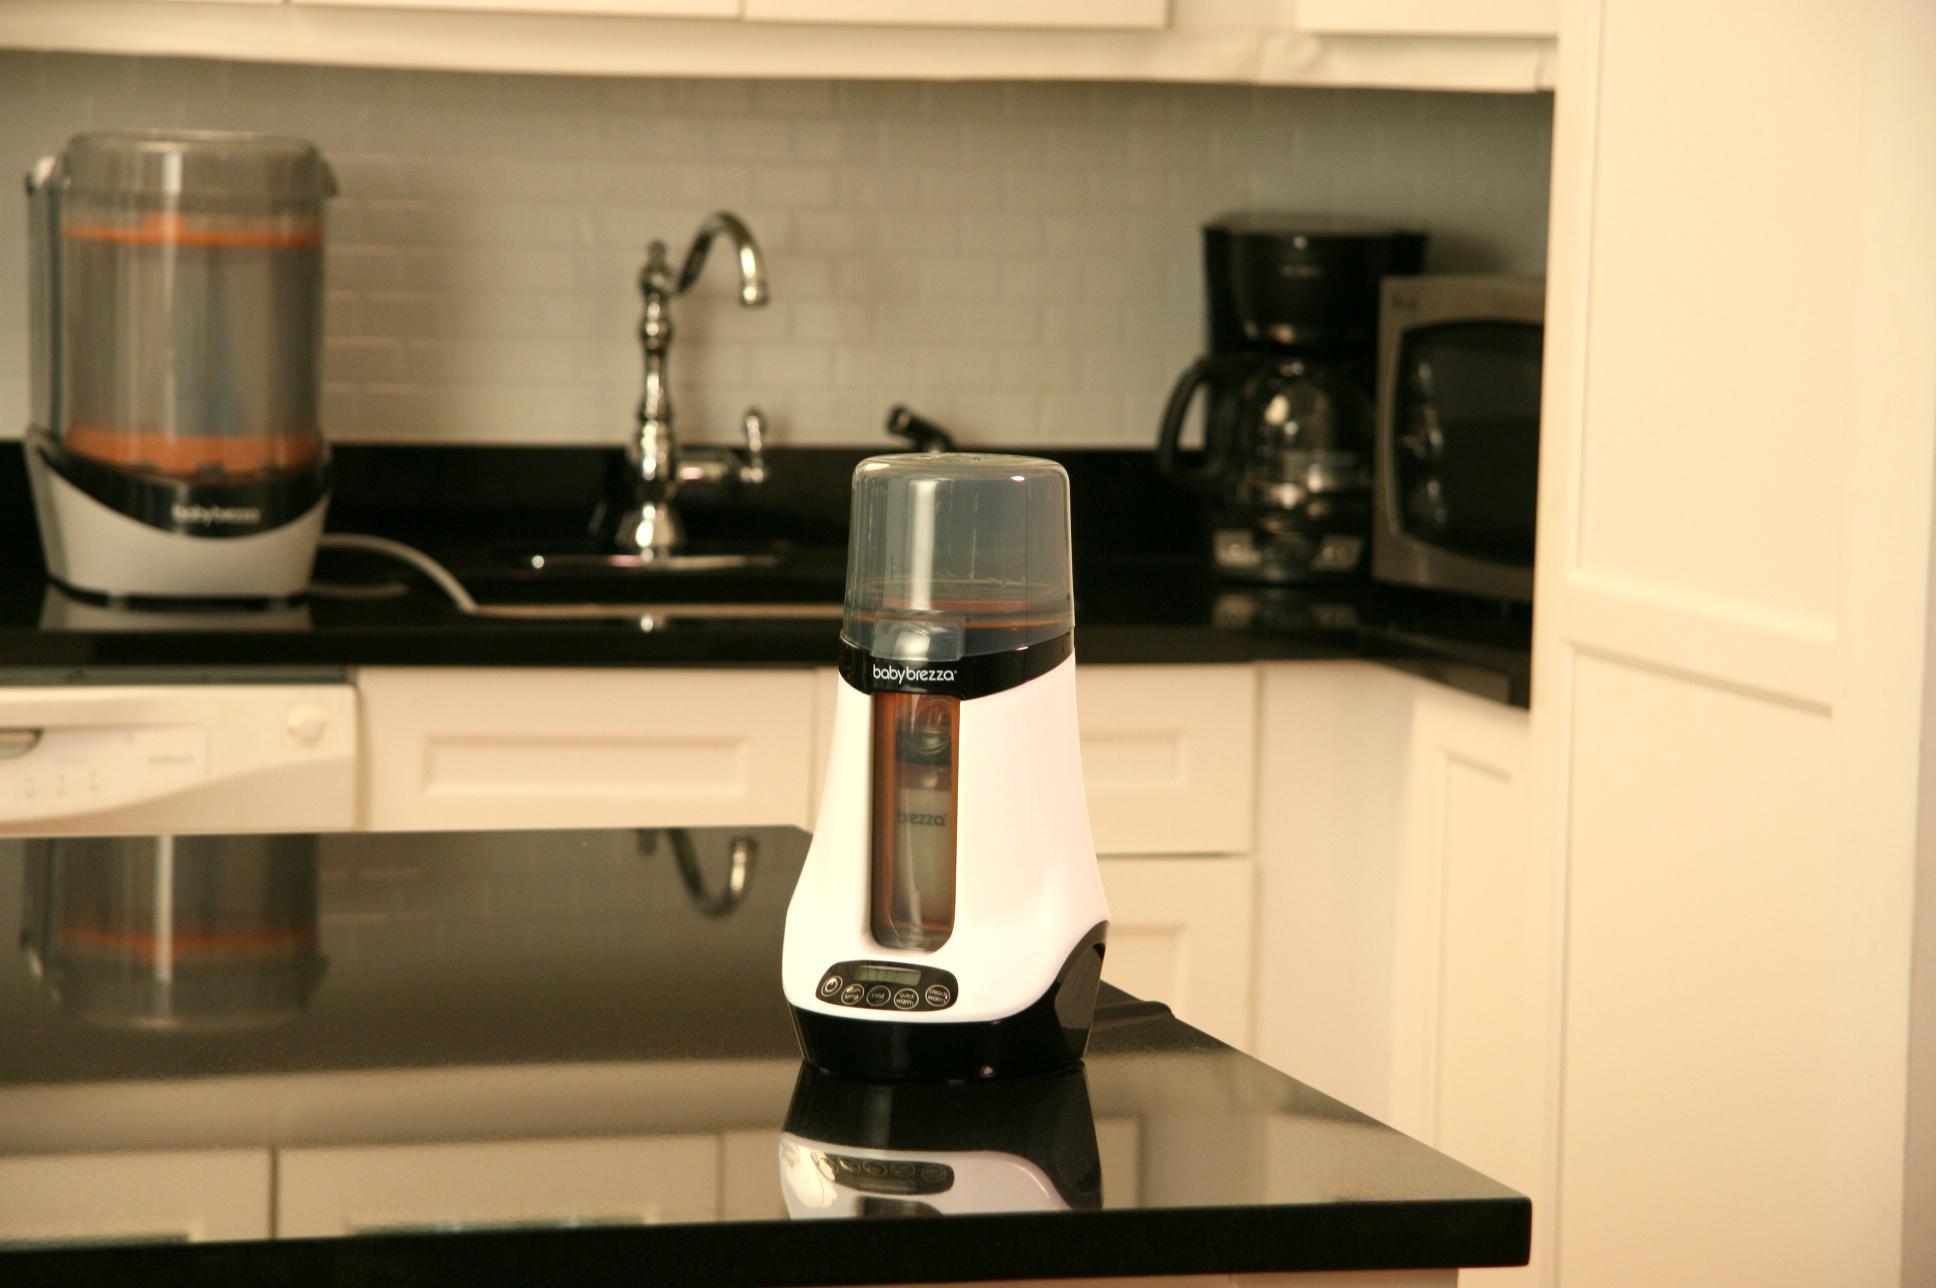 Safe + Smart Bottle Warmer from Baby Brezza